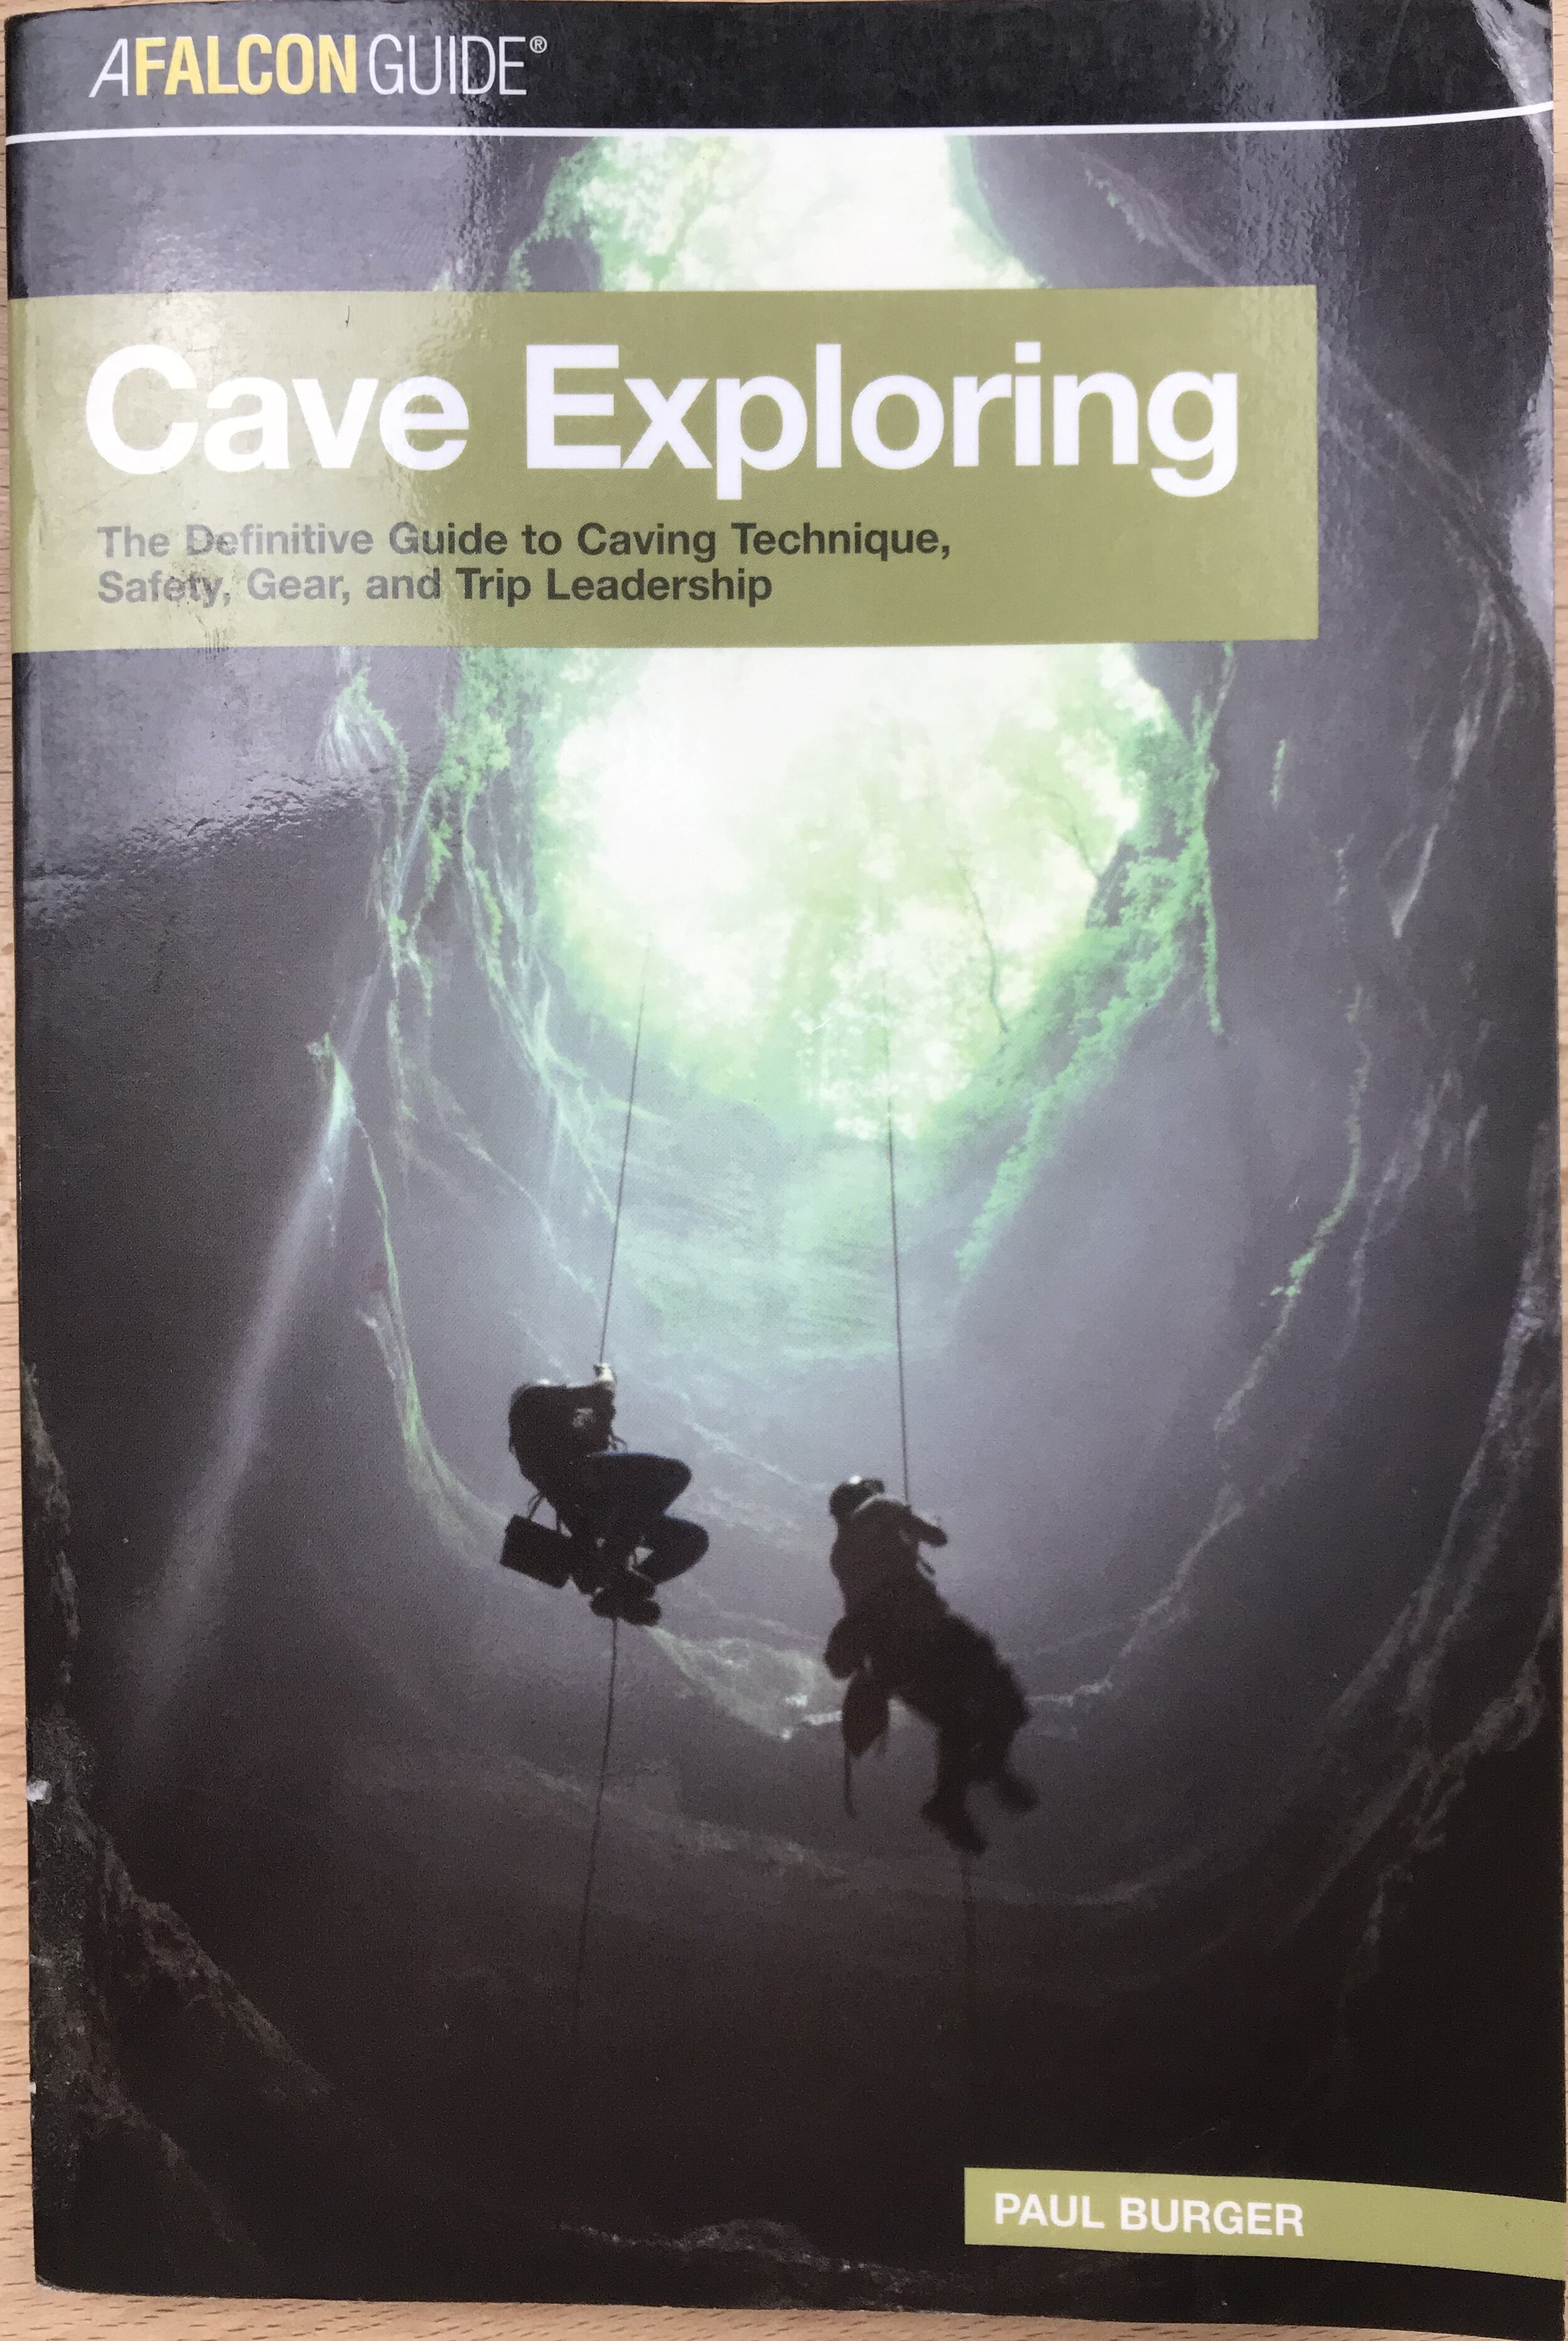 Cave Exploring 1.jpg